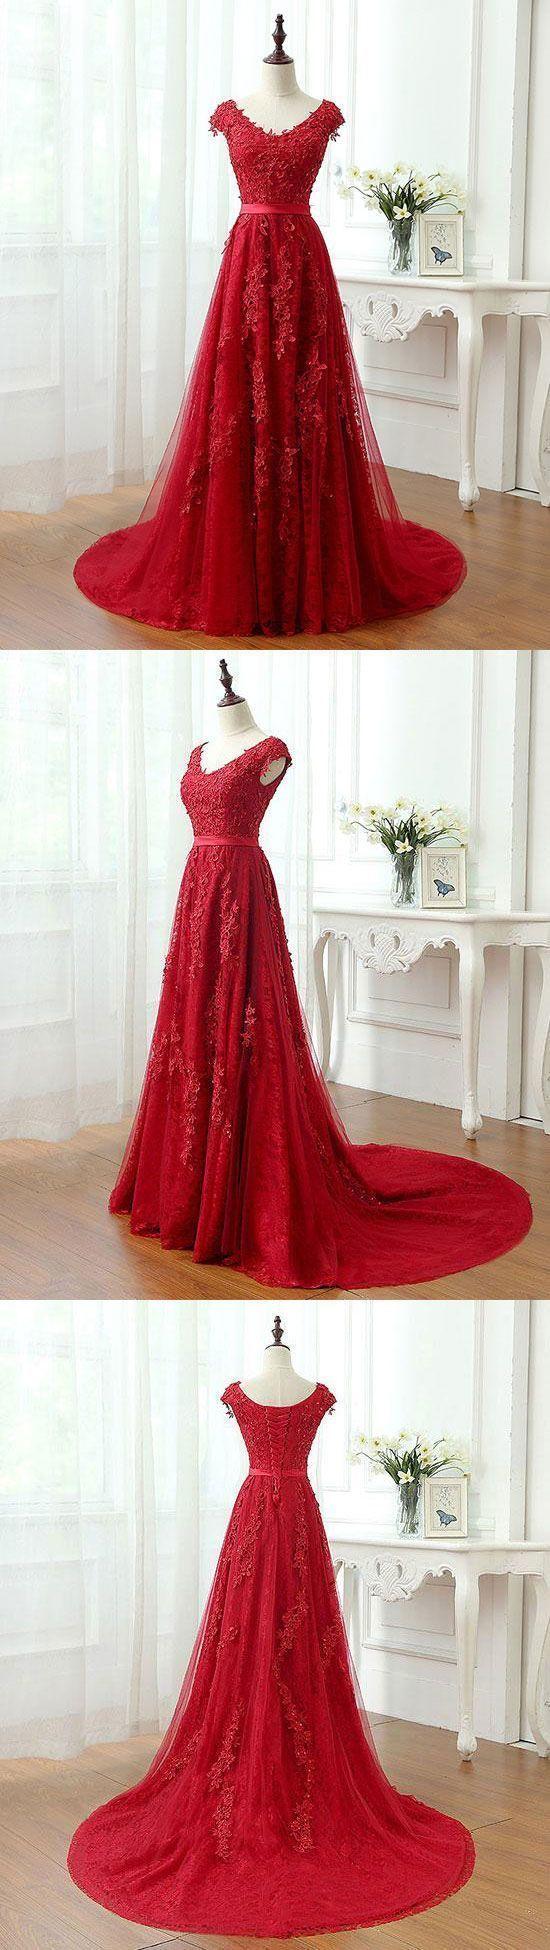 Elegant appliques aline prom dresseslong prom dressescheap prom